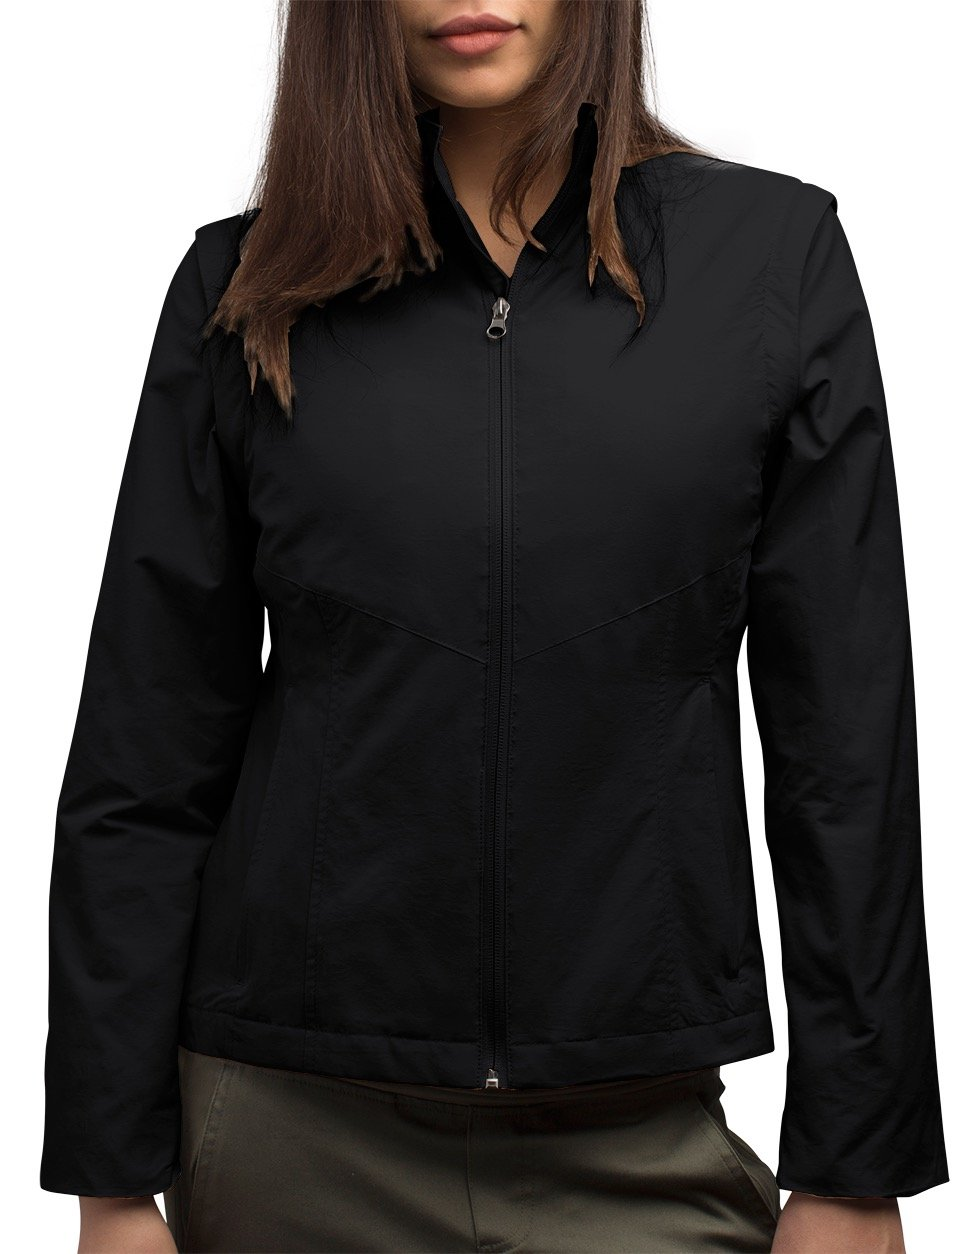 Women's SCOTTeVEST Jacket - 23 Pockets - Travel Clothing BLK M2 by SCOTTeVEST